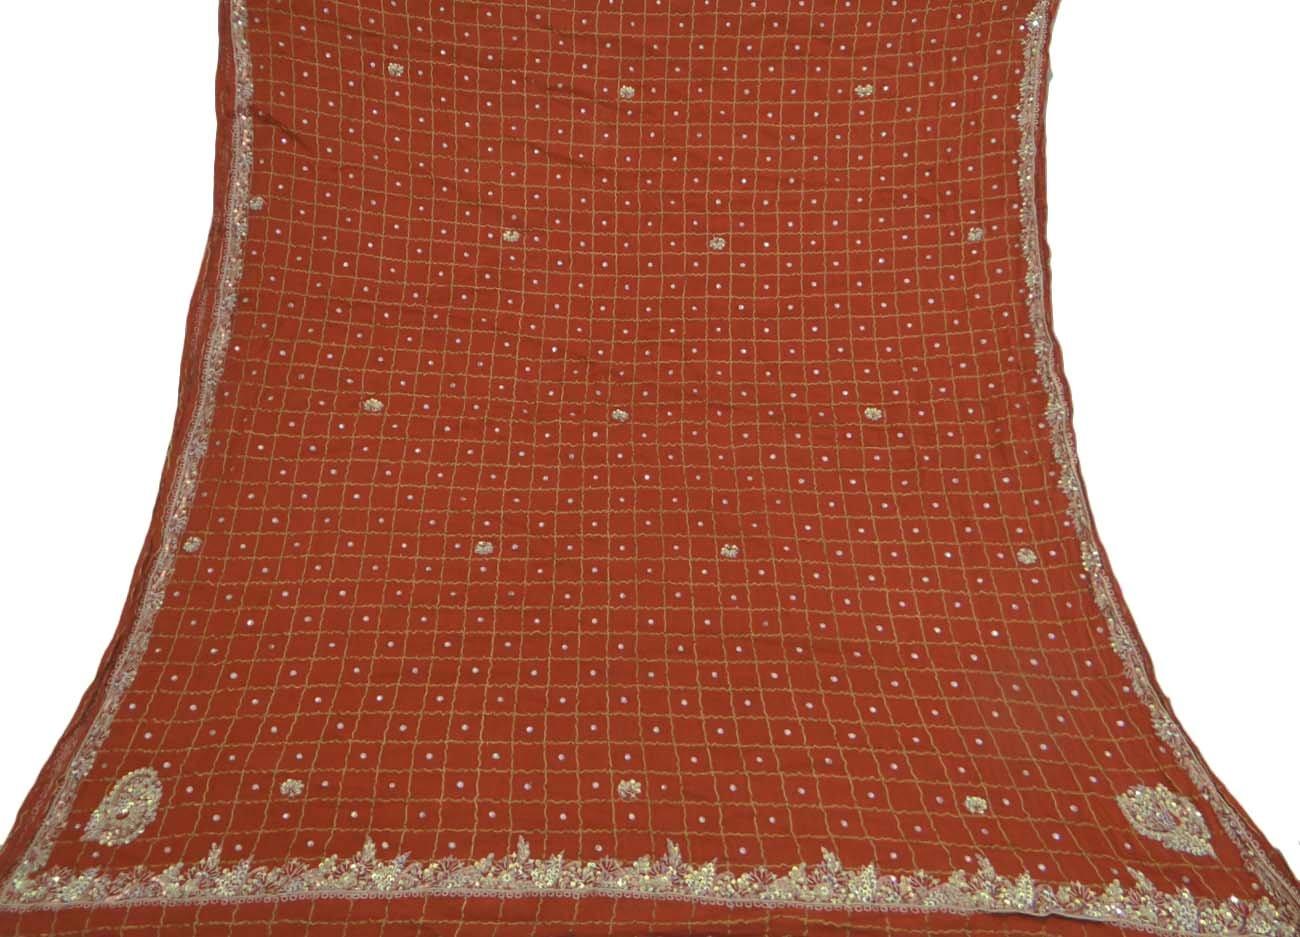 Vintage Dupatta Long Indian Scarf Embroidered Fabric Antique Orange Veil Stole Vintageandyou